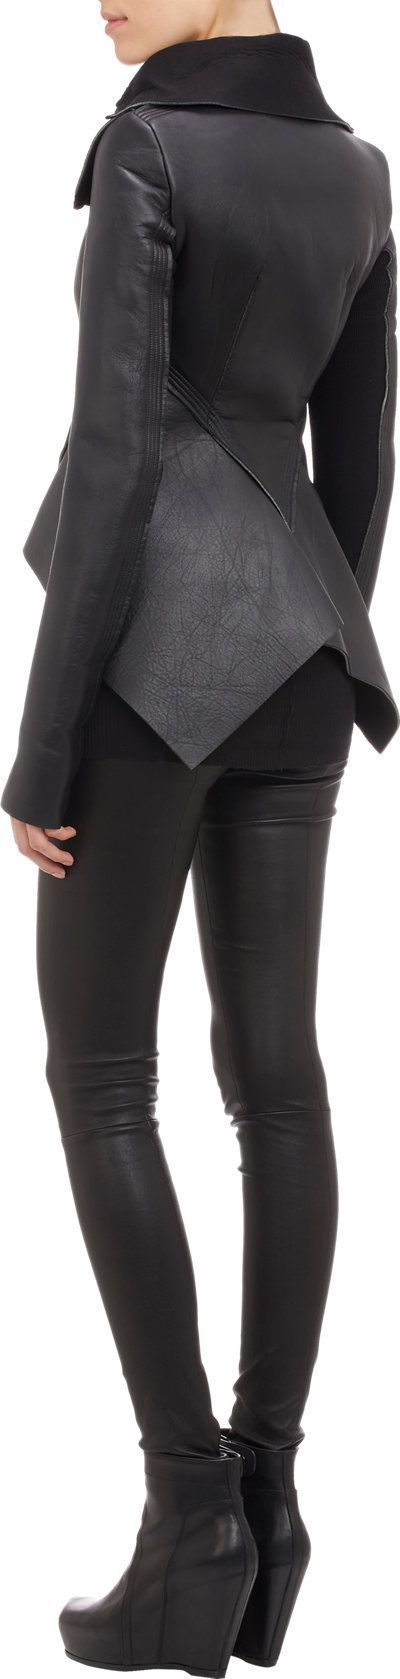 Visions of the Future: Rick Owens Leather & Neoprene Peplum Jacket at Barneys.com: